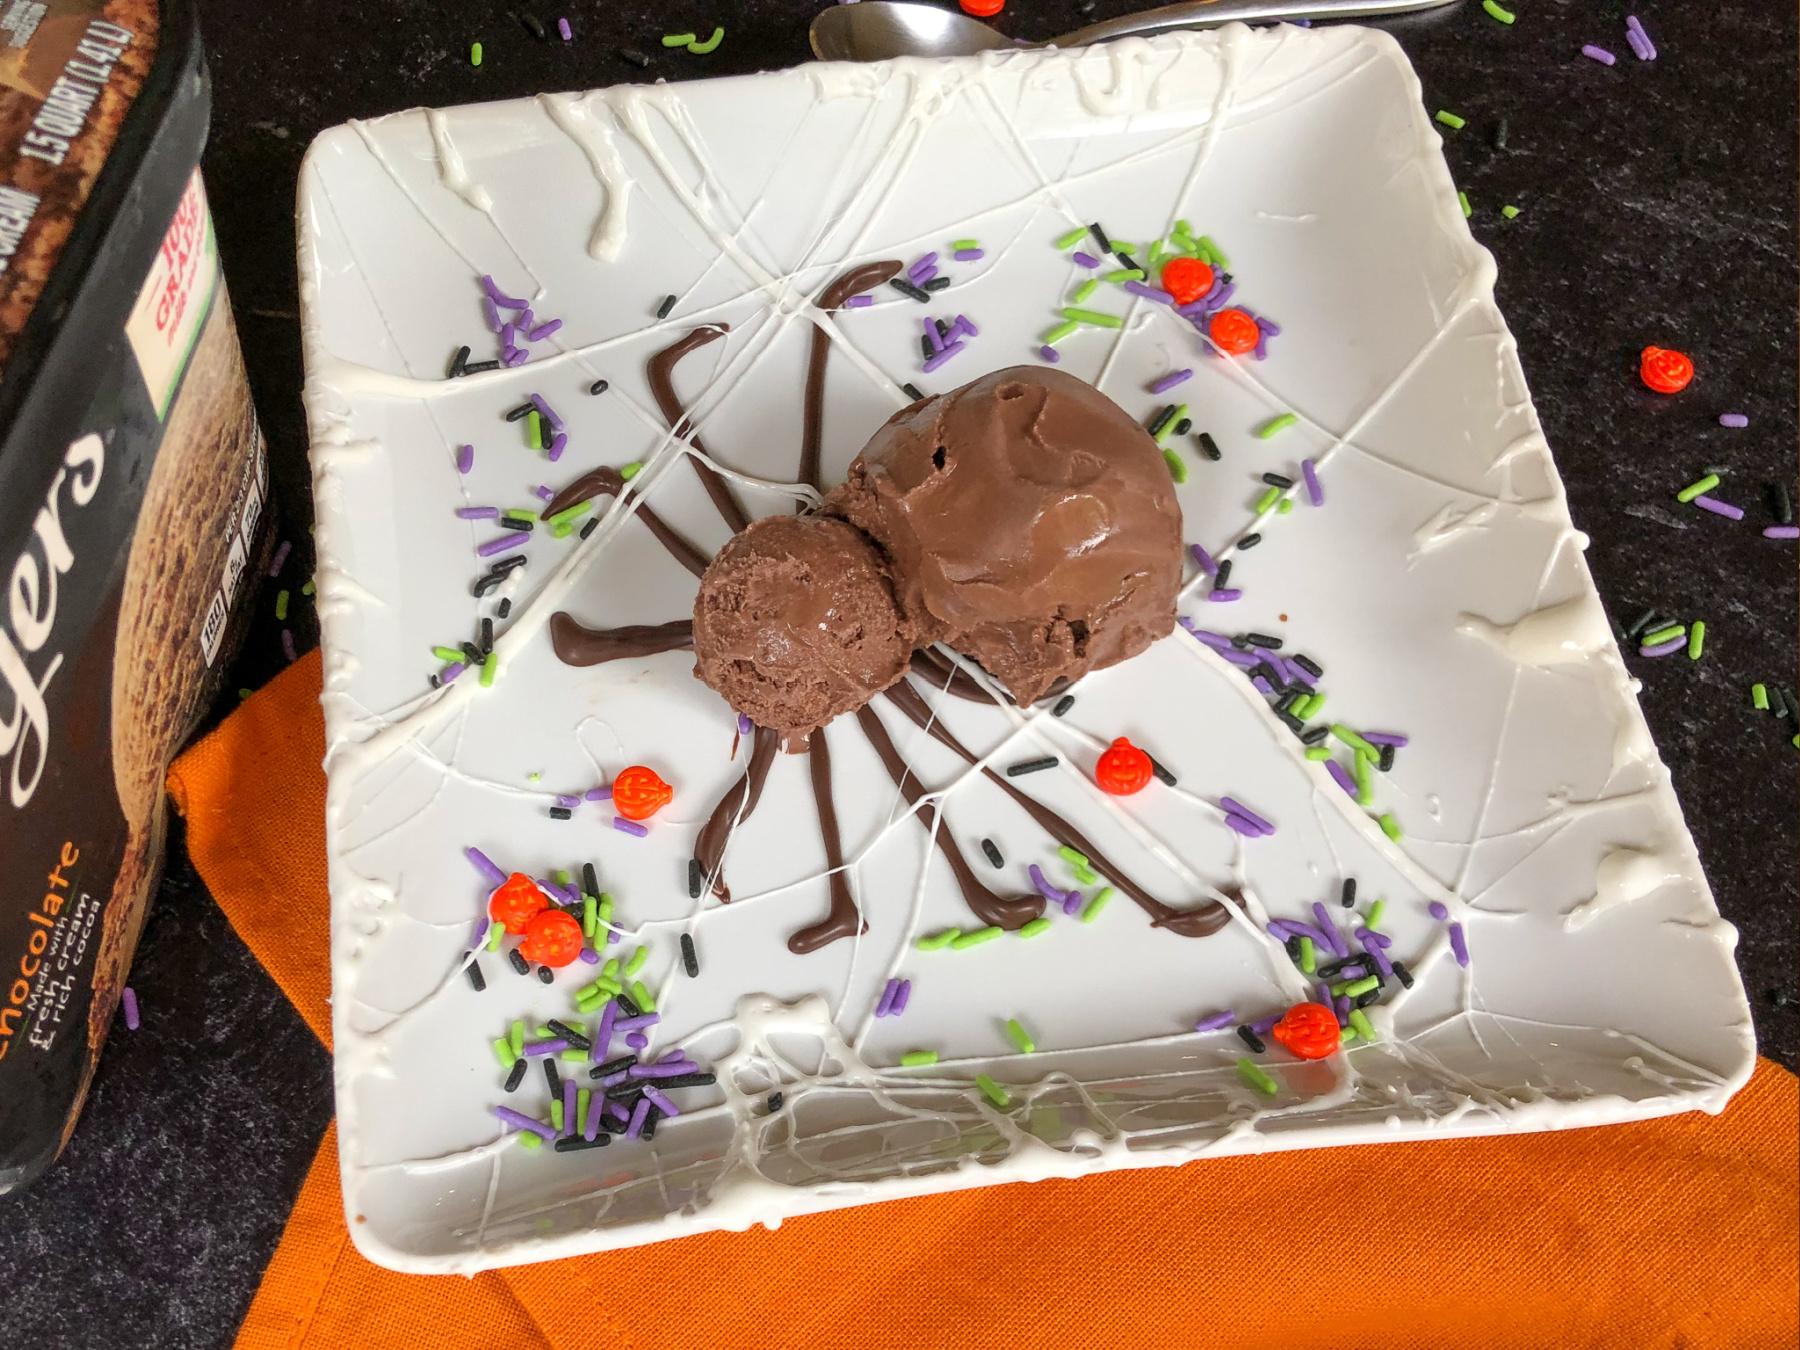 Serve Up A Fun Halloween Treat Using Breyers Ice Cream - On Sale BOGO At Publix! on I Heart Publix 3